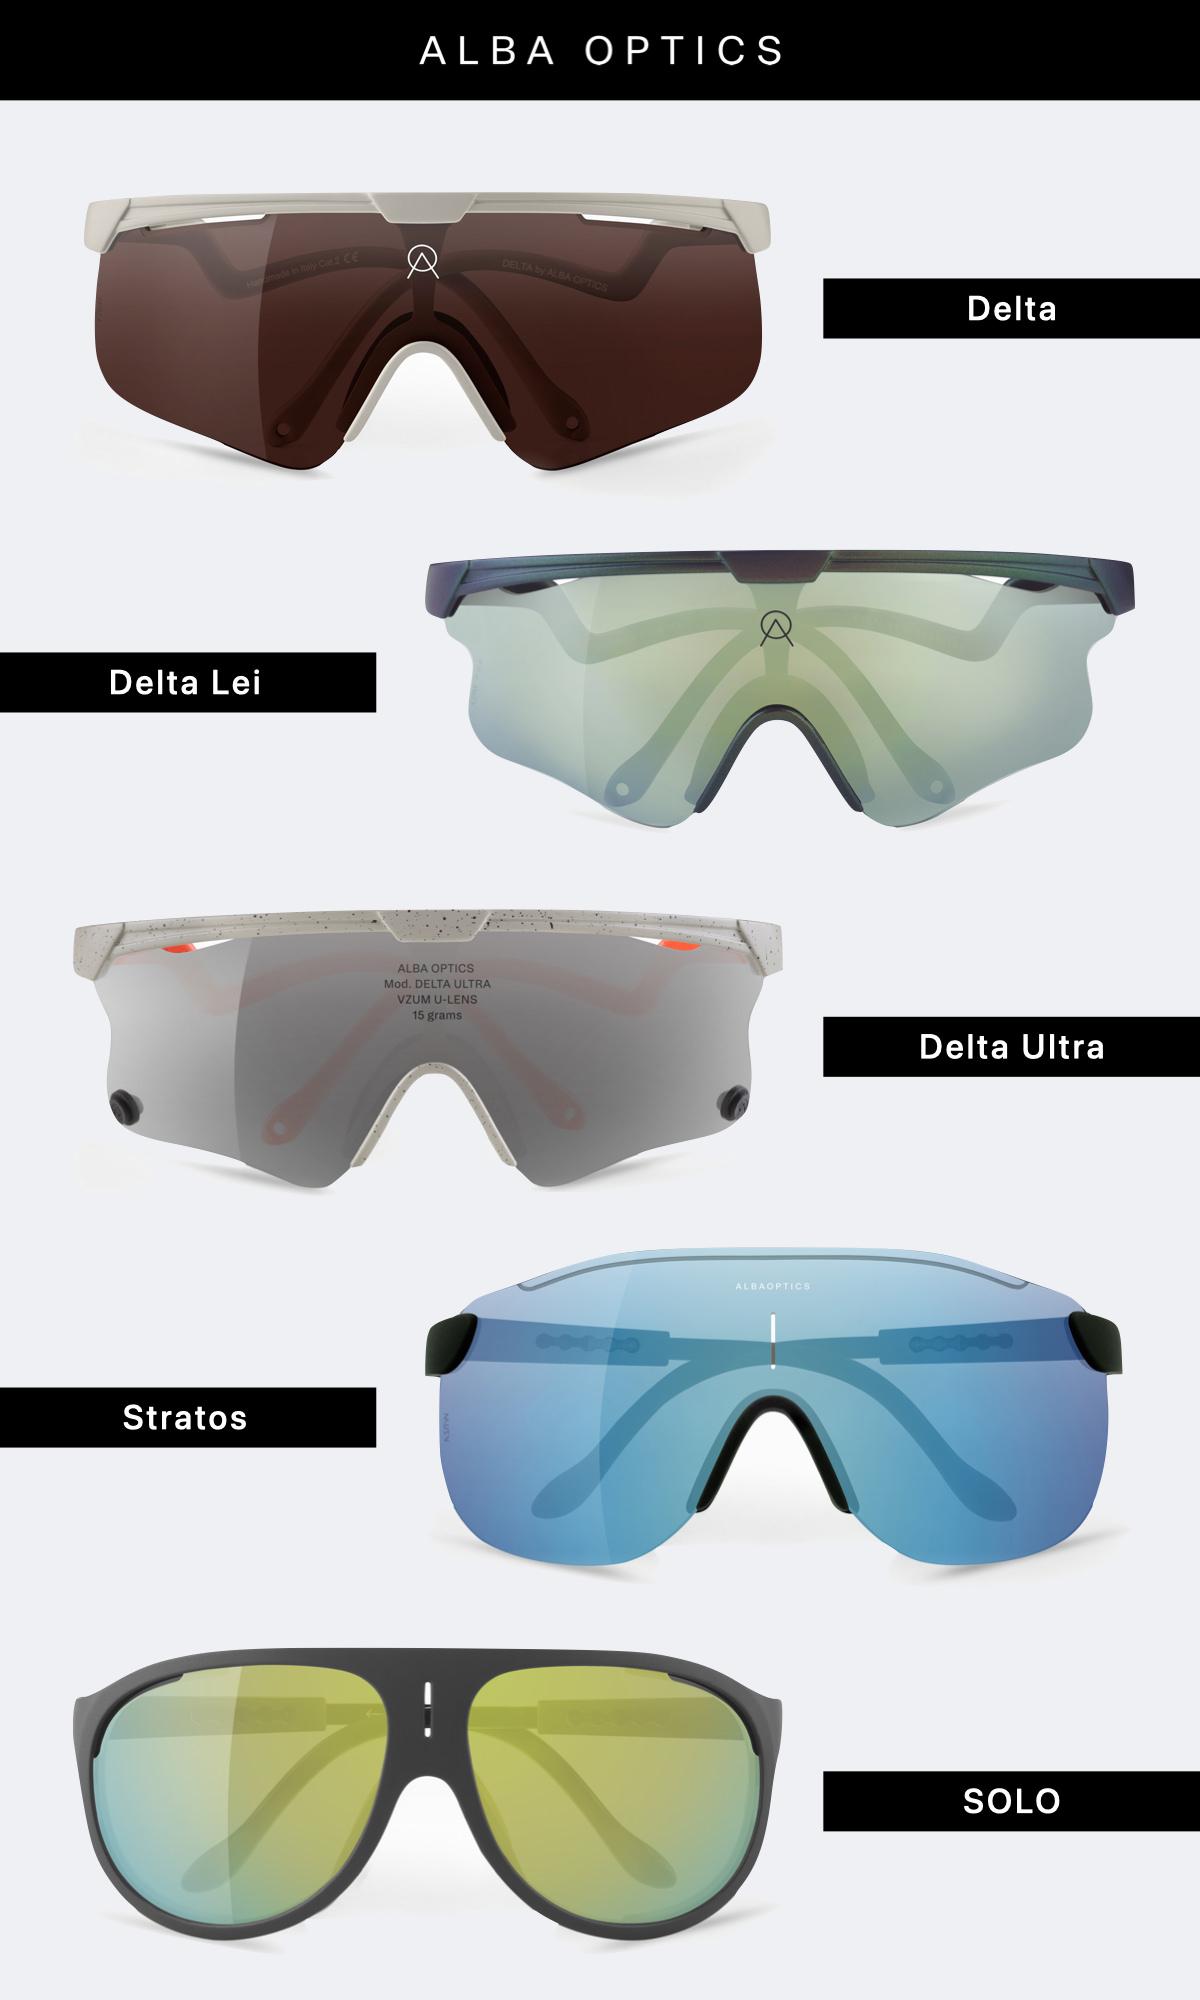 Alba Optics ラインナップ